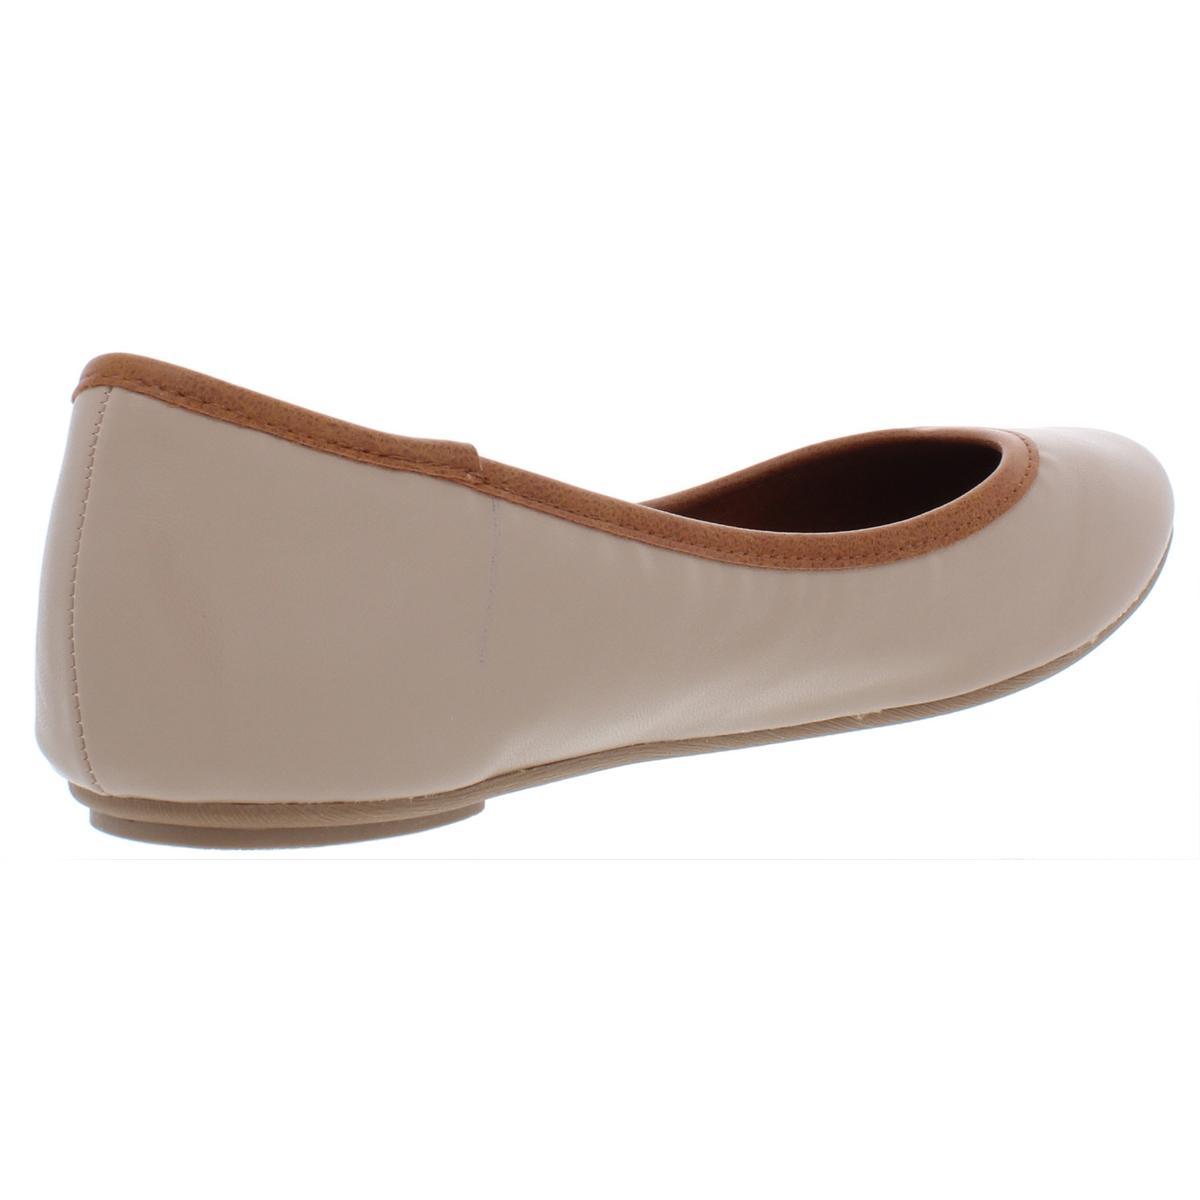 American-Rag-Womens-Cellia-Contrast-Trim-Slip-On-Ballet-Flats-Shoes-BHFO-6452 thumbnail 10